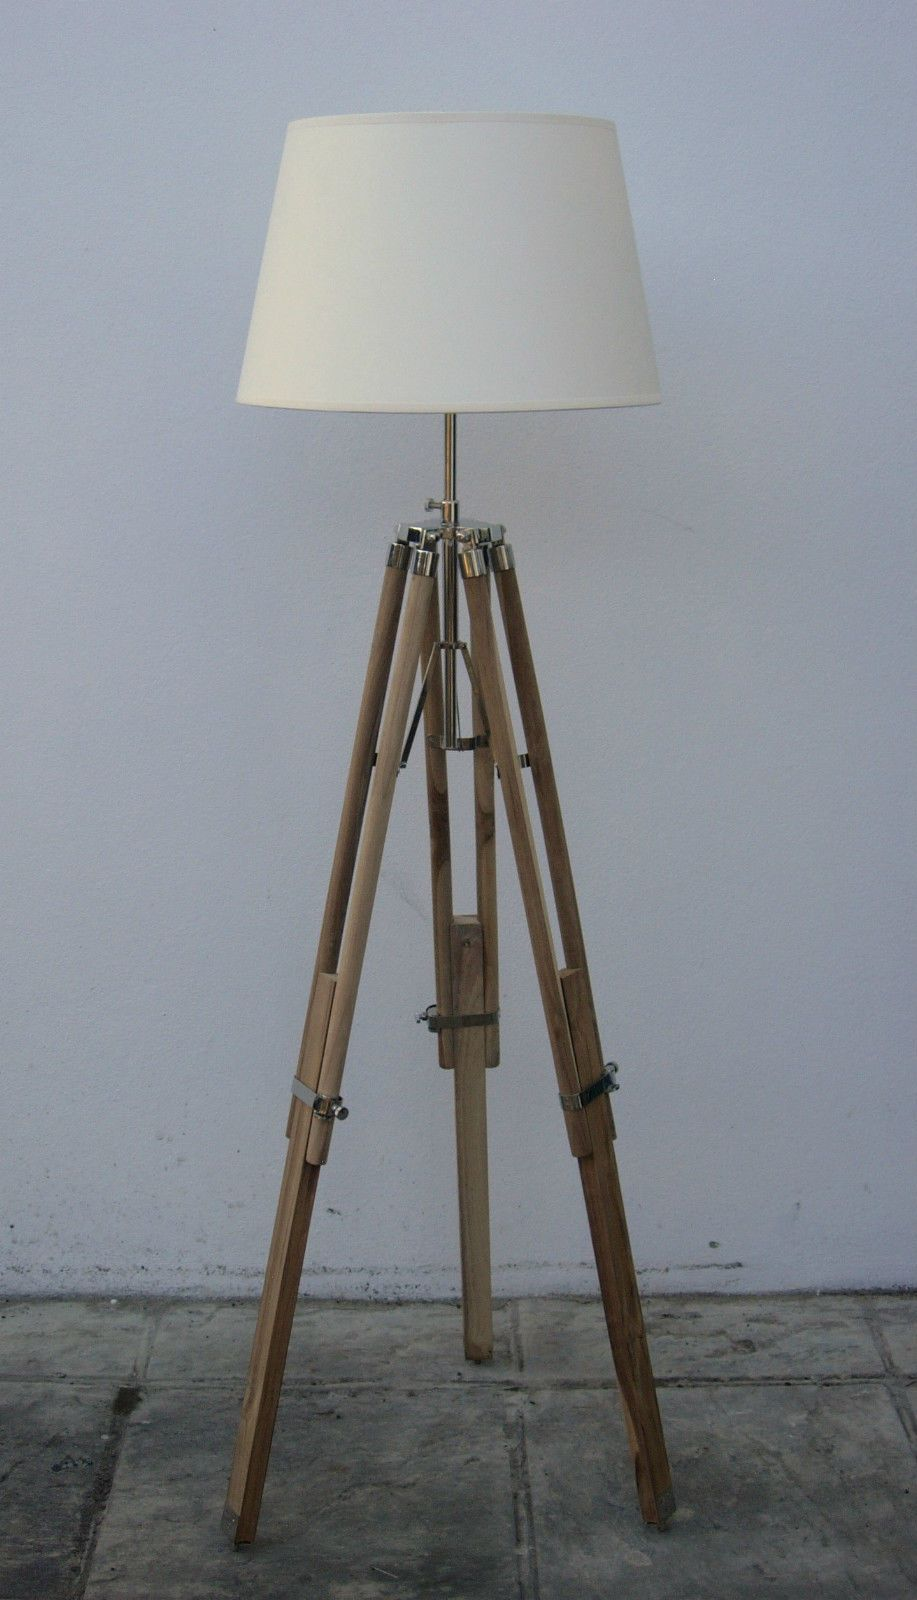 Modern Tripod Light Standard Floor Lamp Without Shade